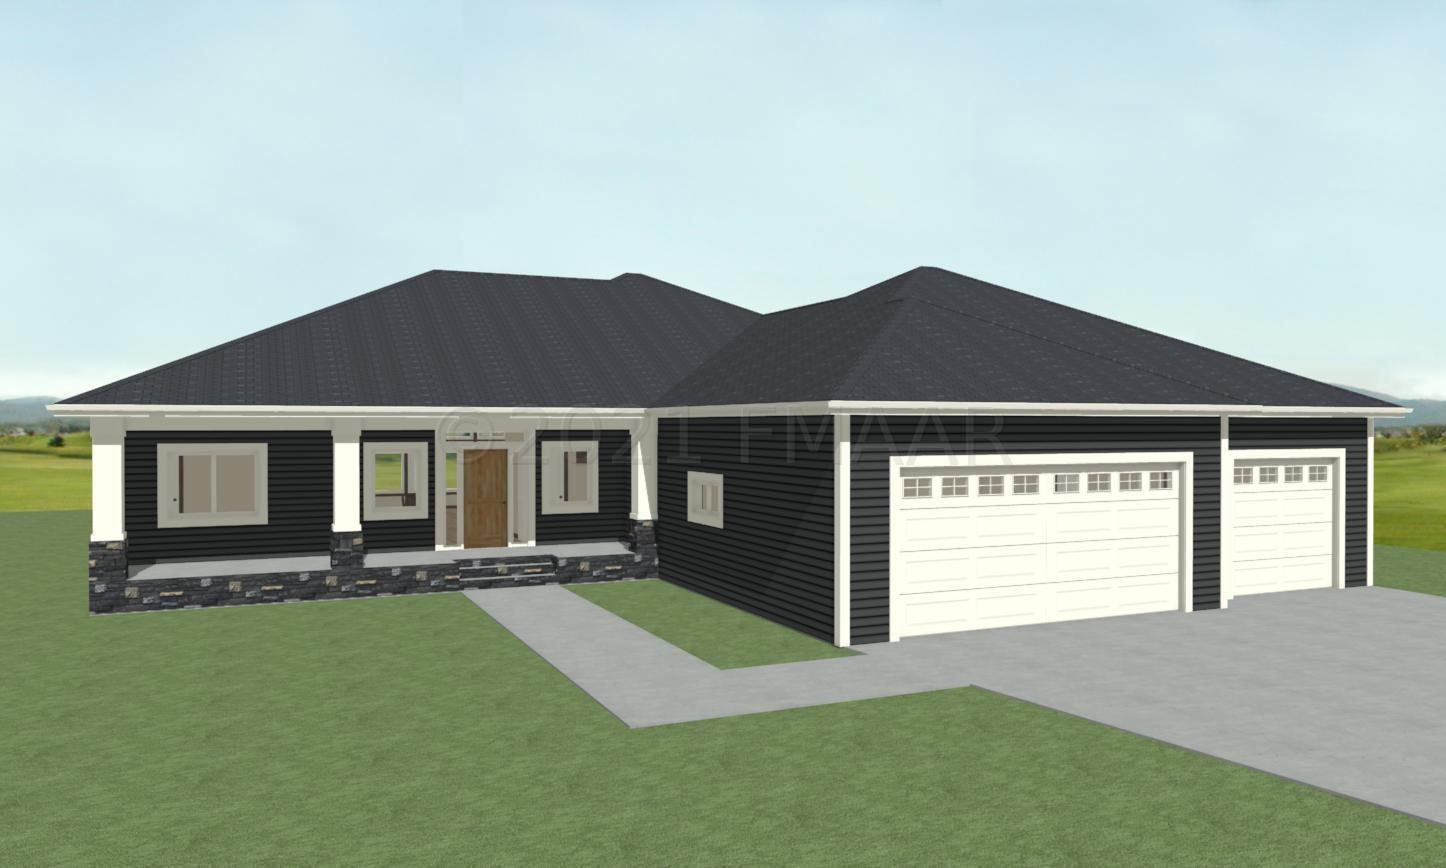 5338 GRAYLAND Drive S, Fargo, ND 58104